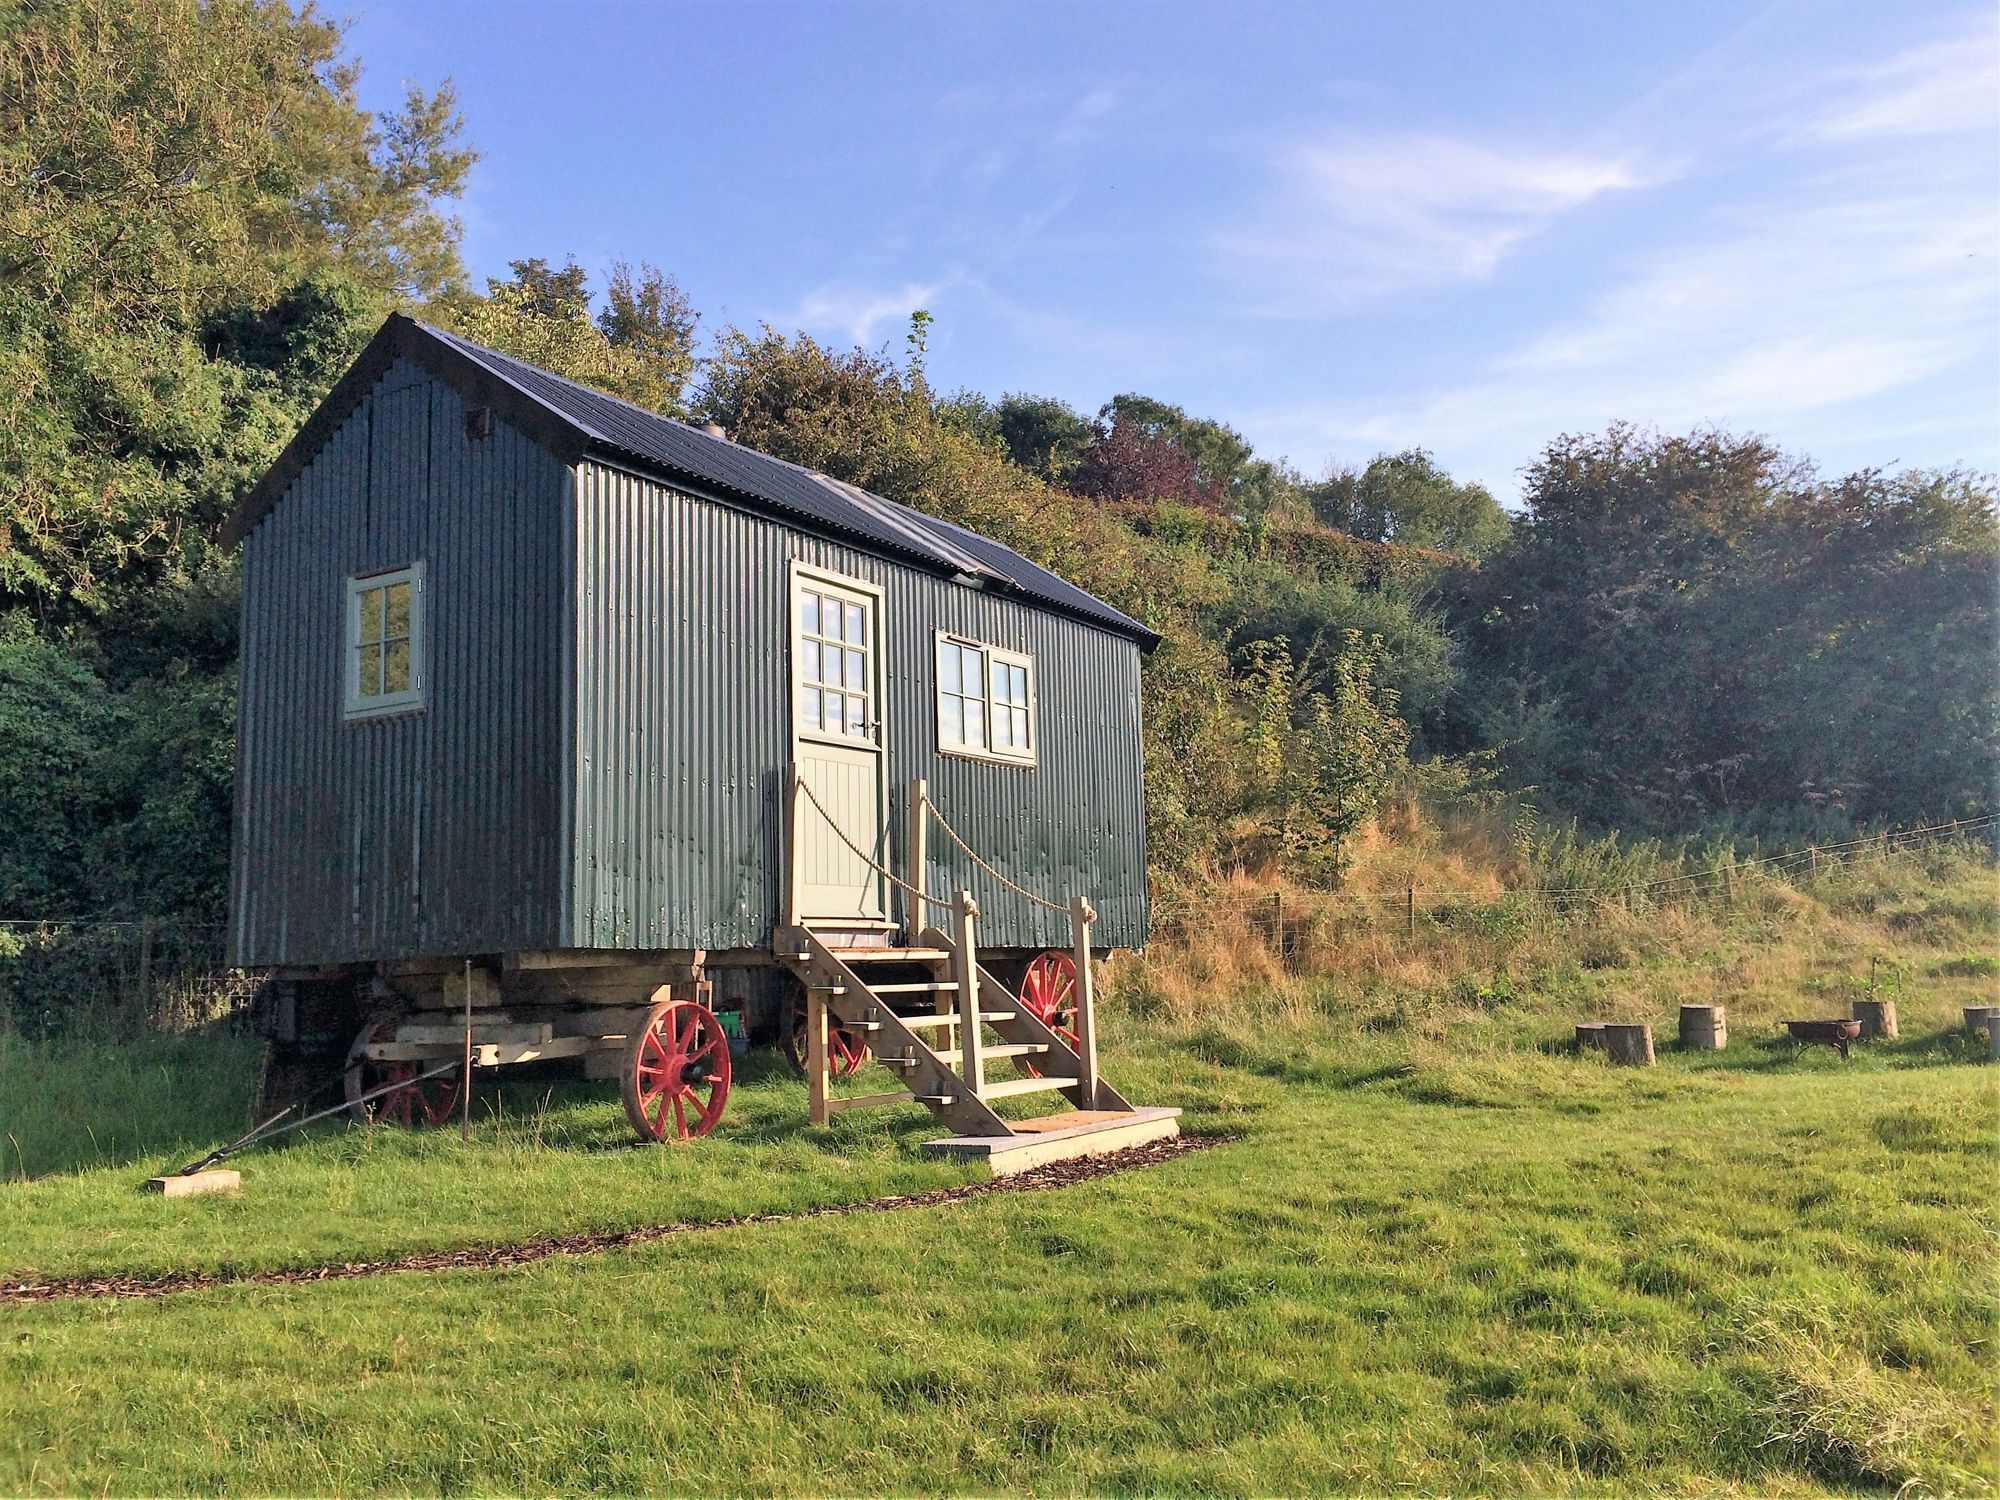 Six Romantic Shepherd's Huts for New Years Eve